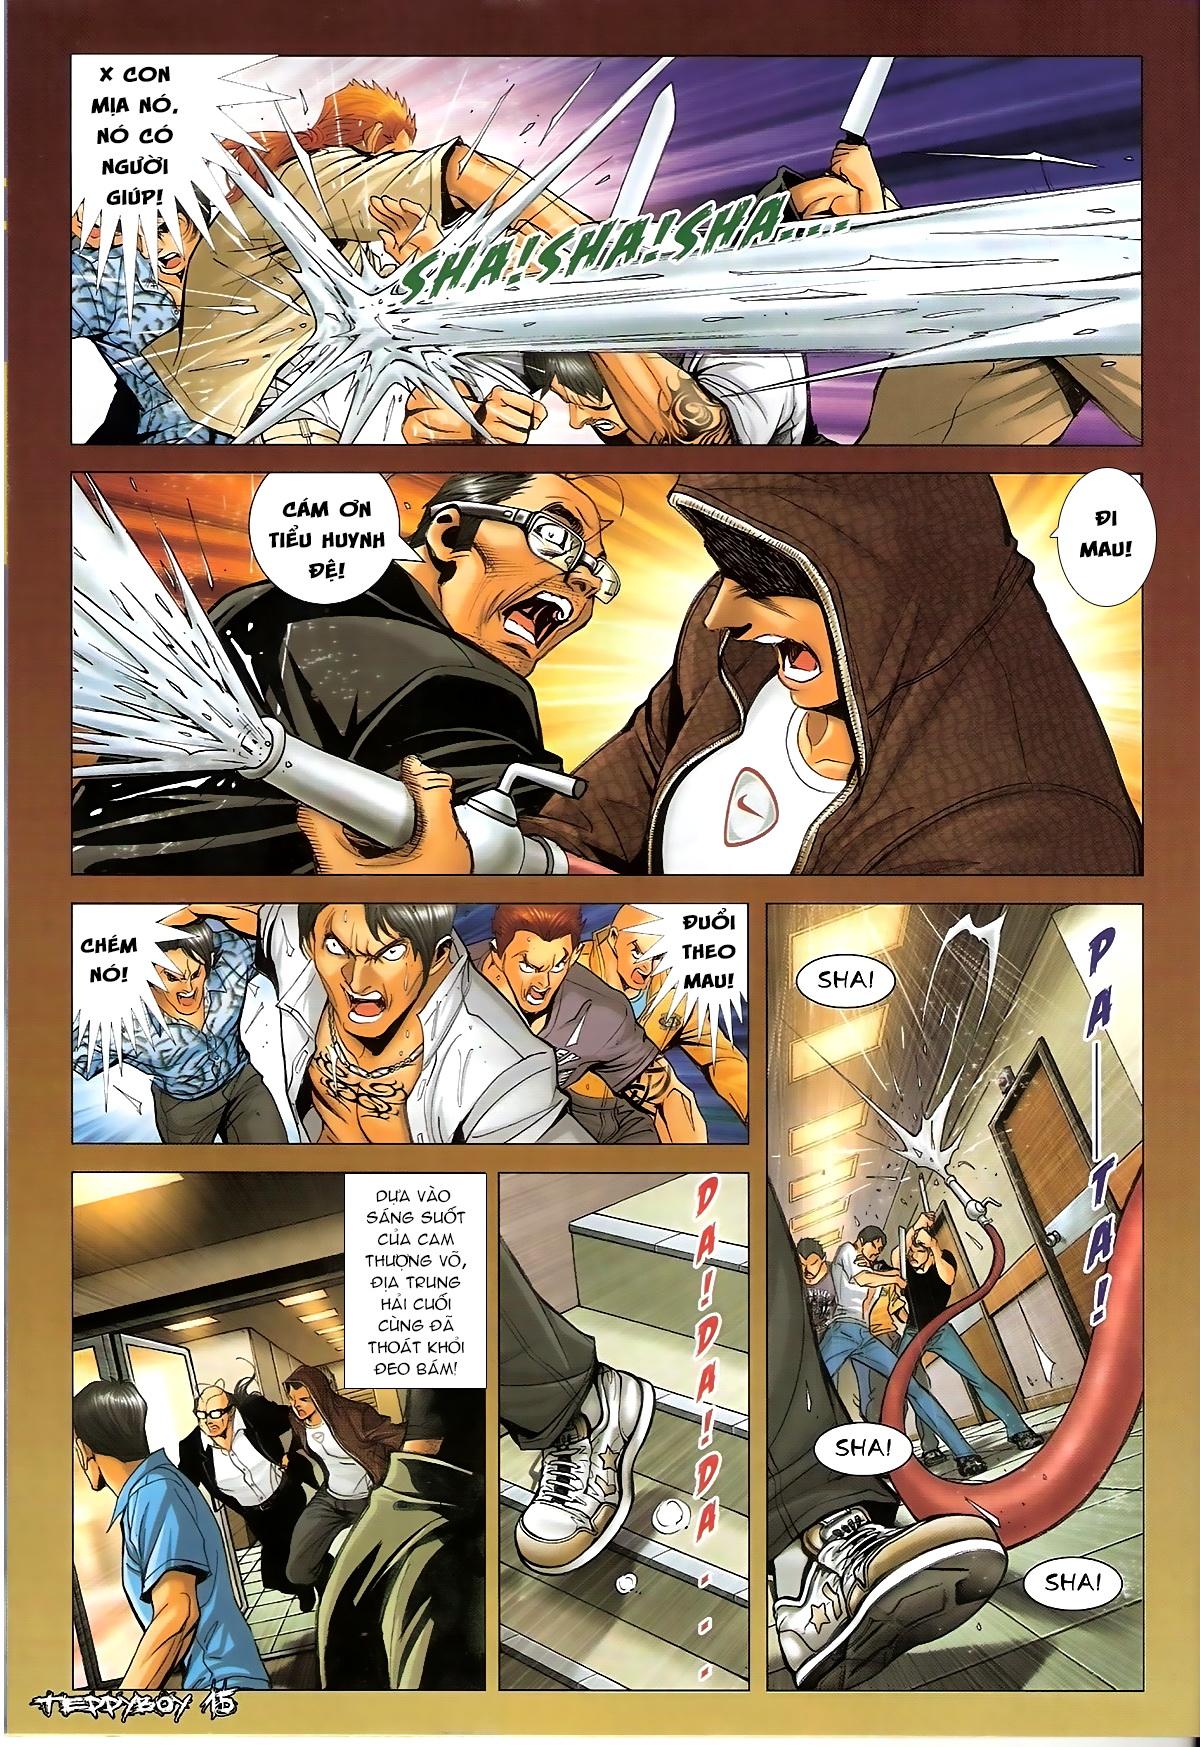 Người Trong Giang Hồ - Chapter 1317: Tao phải thắng lão - Pic 13